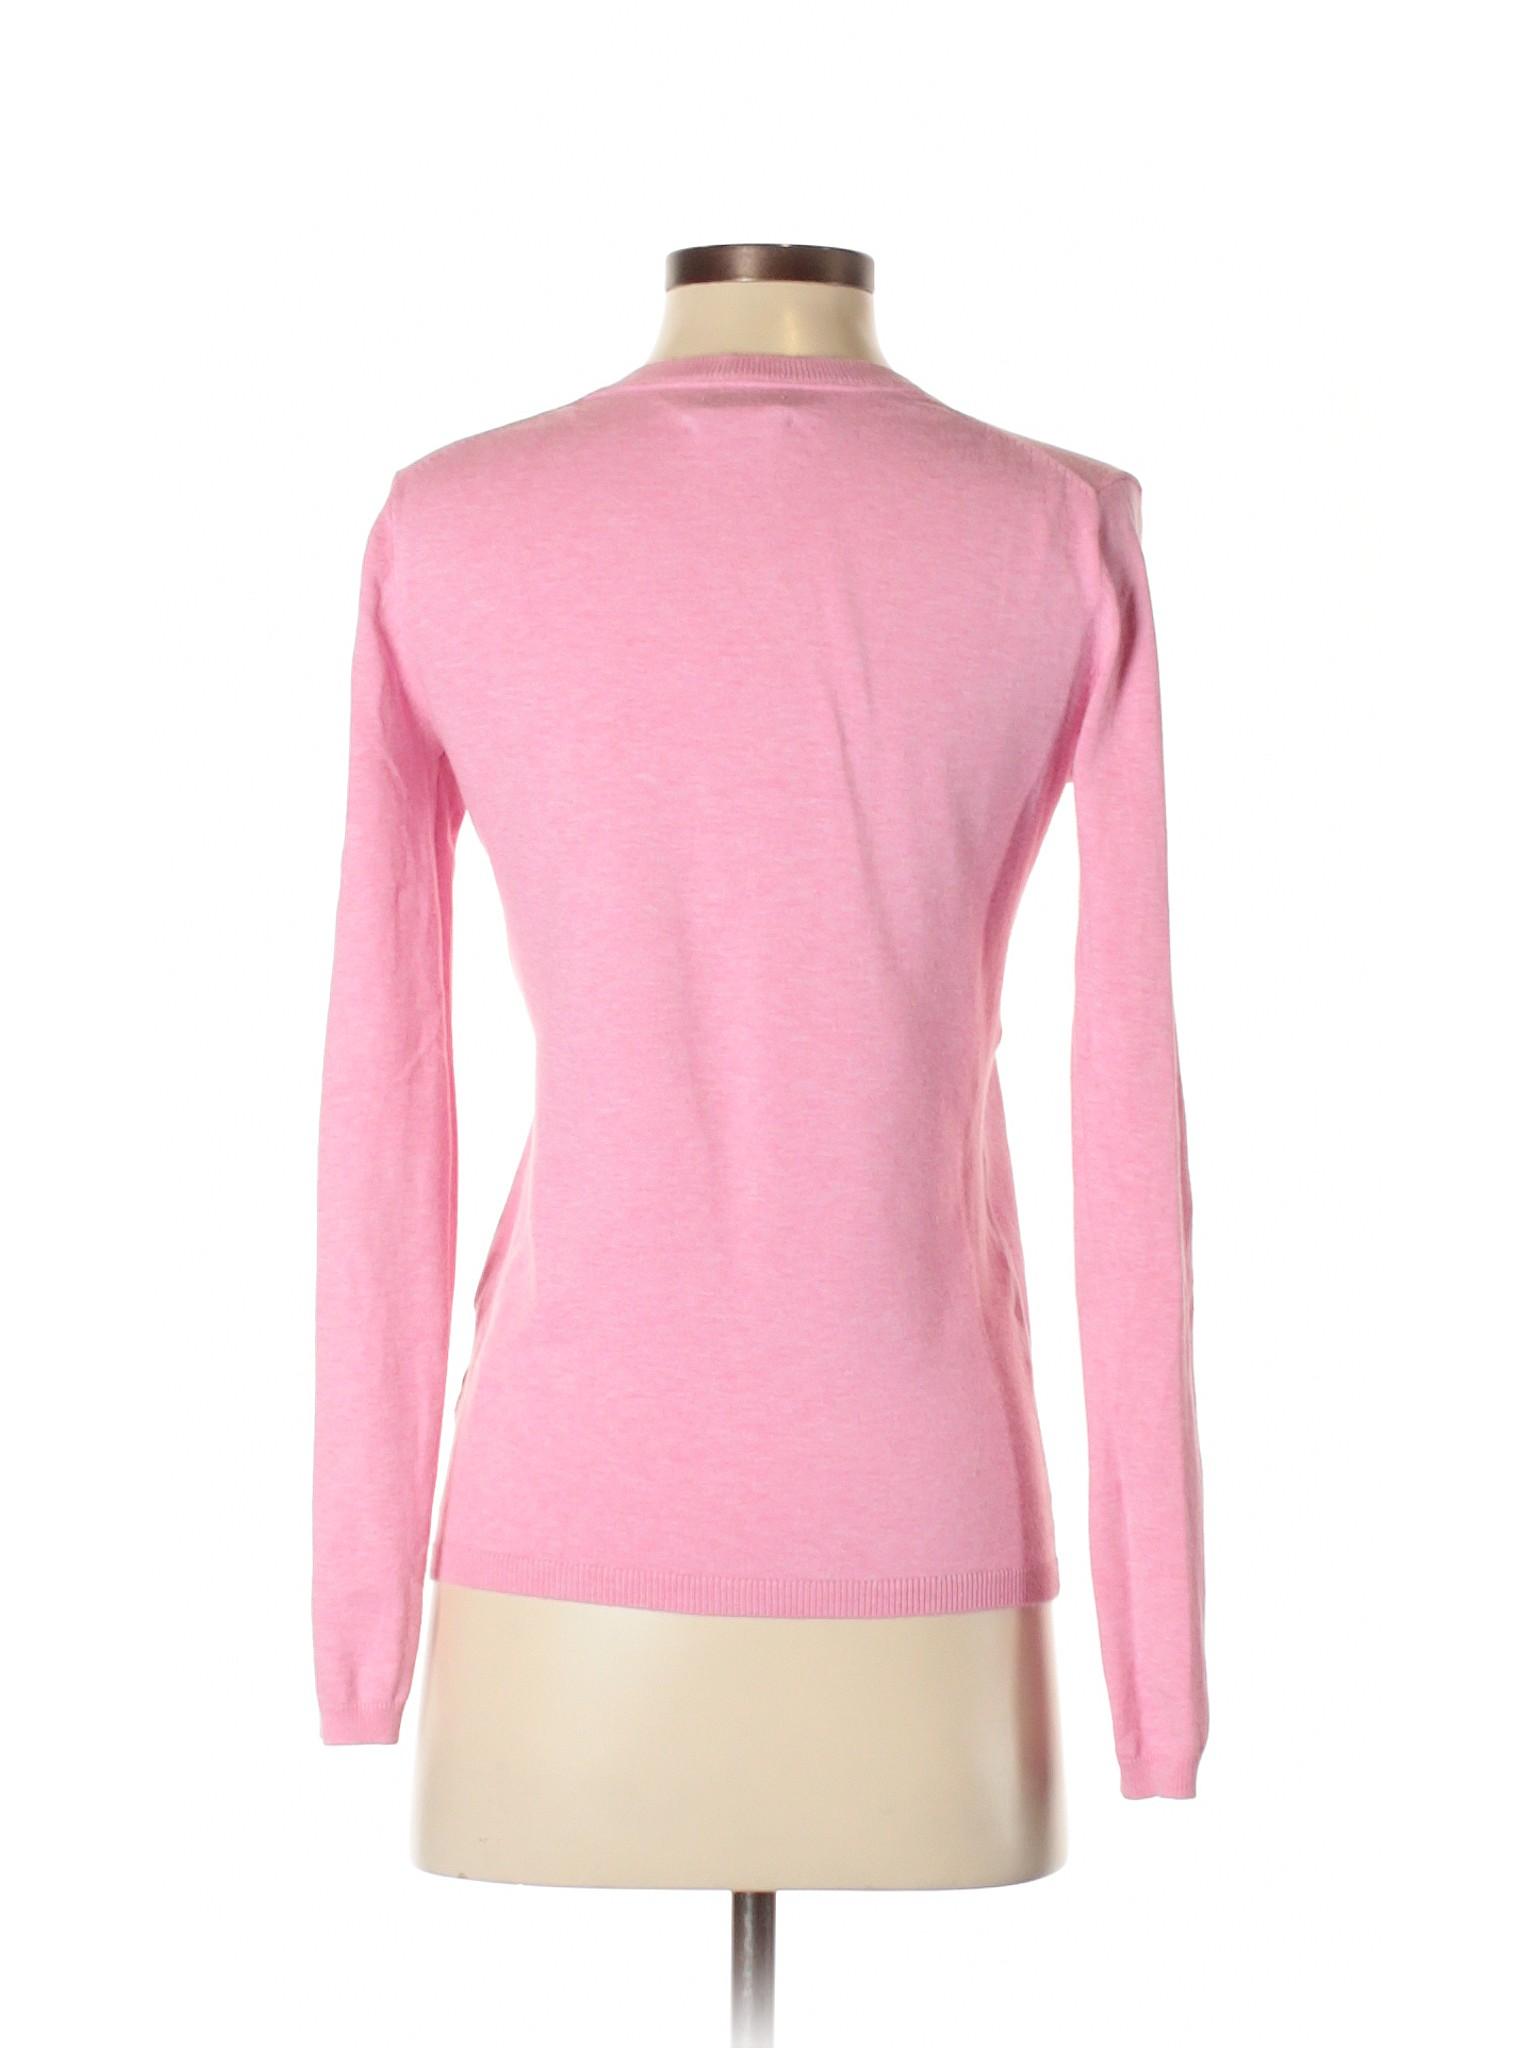 Boutique Sweater Hilfiger Hilfiger Boutique Sweater Tommy Tommy Boutique Pullover Pullover SPIPqr